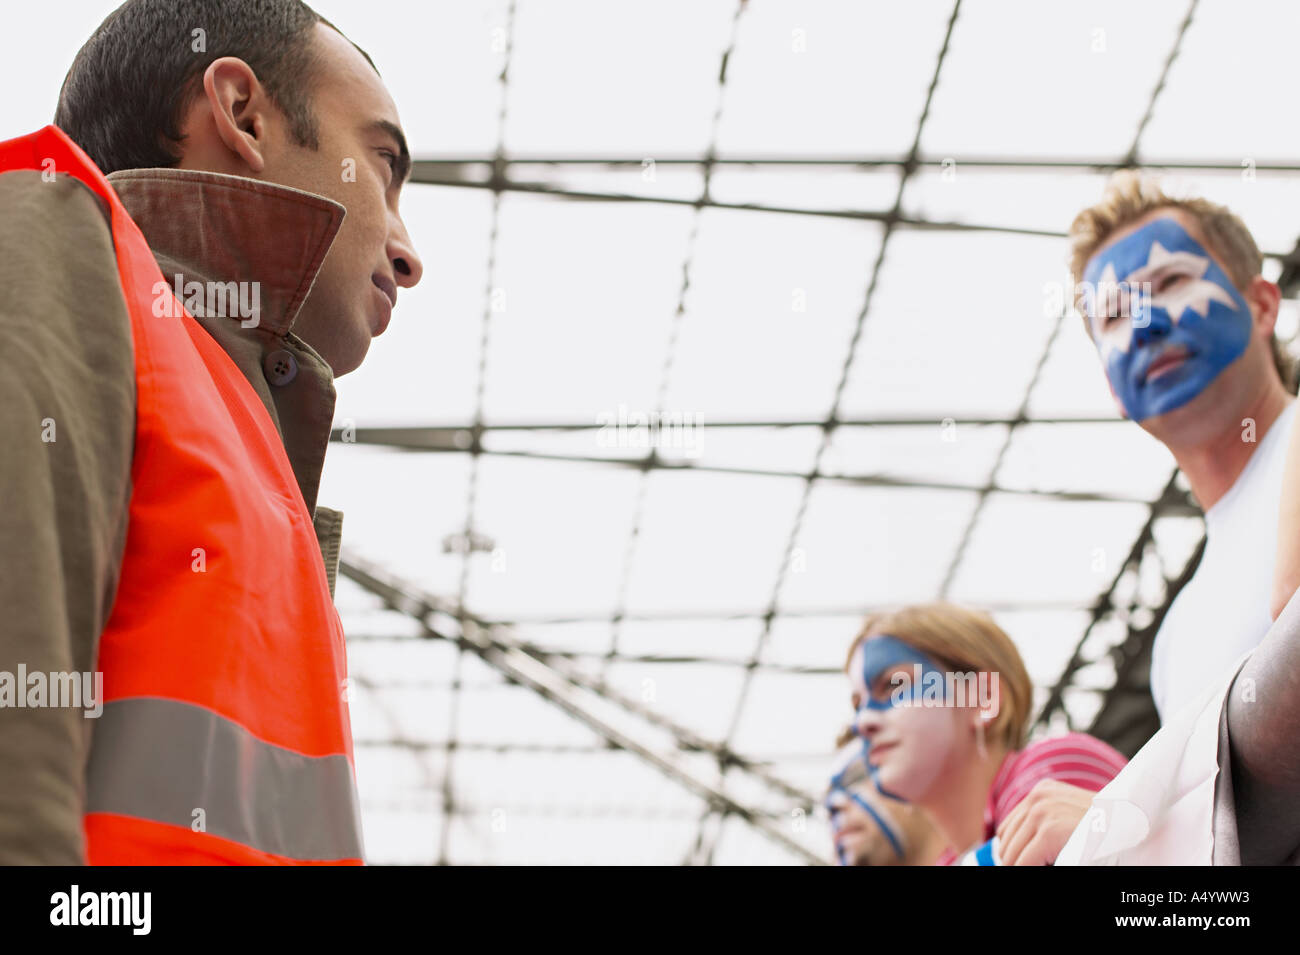 Les supporters de football regarder Steward Photo Stock